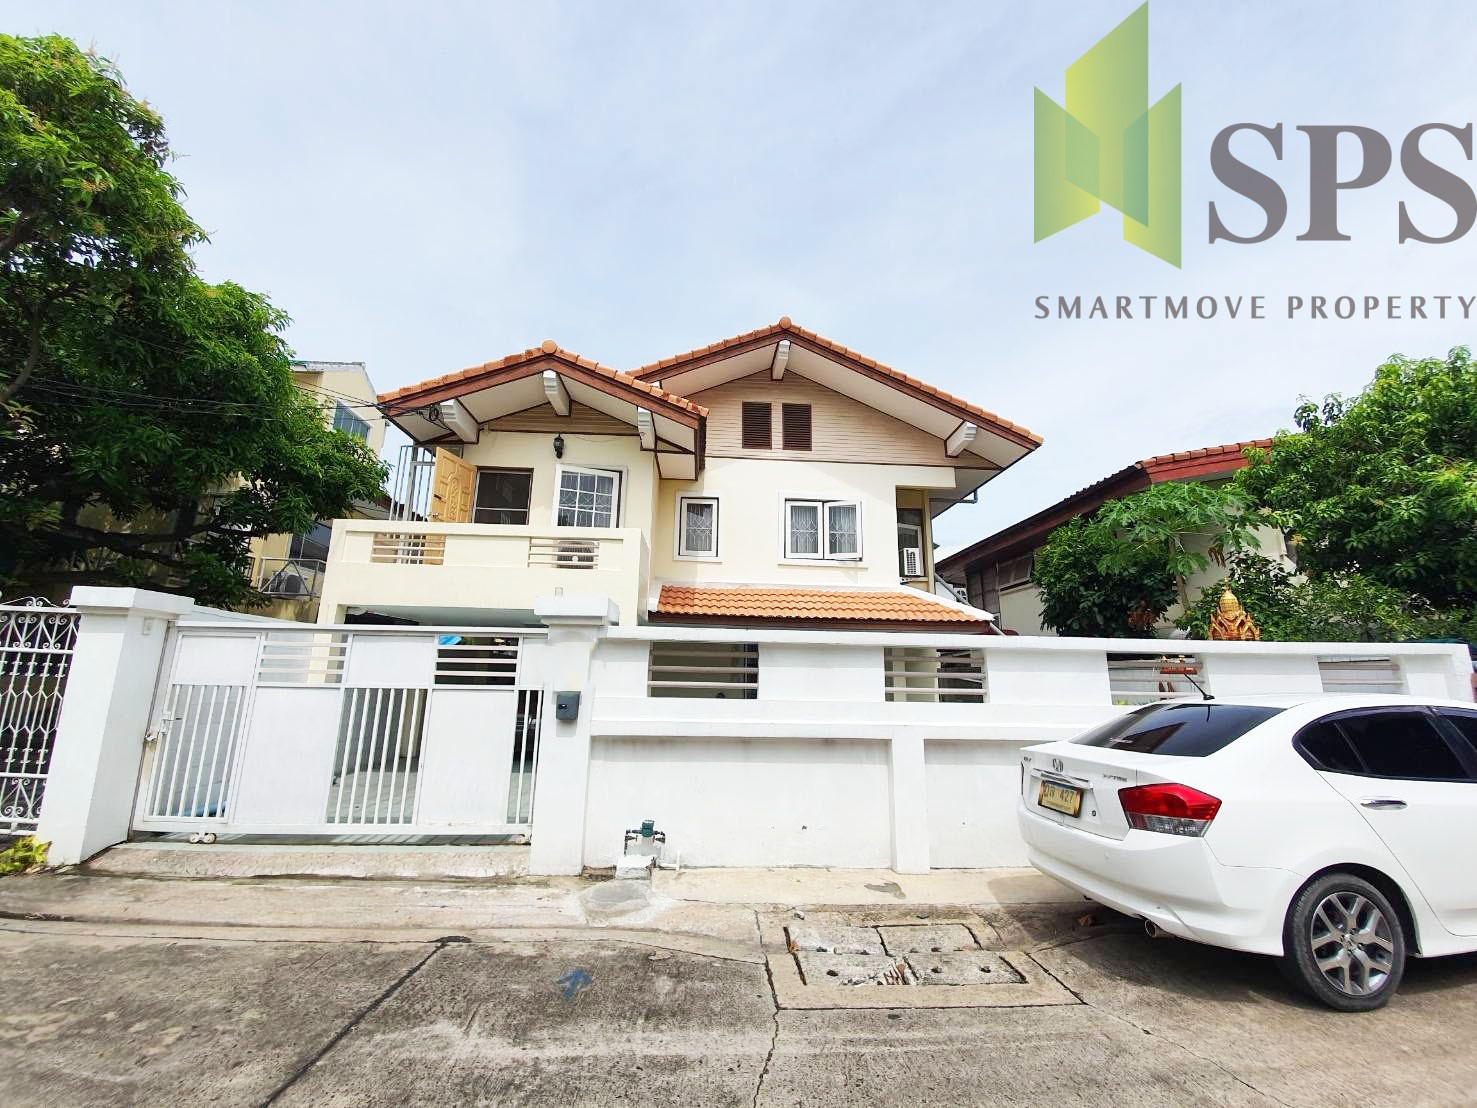 Single House for RENT in Sukhumvit 101/1 (SPSP318)